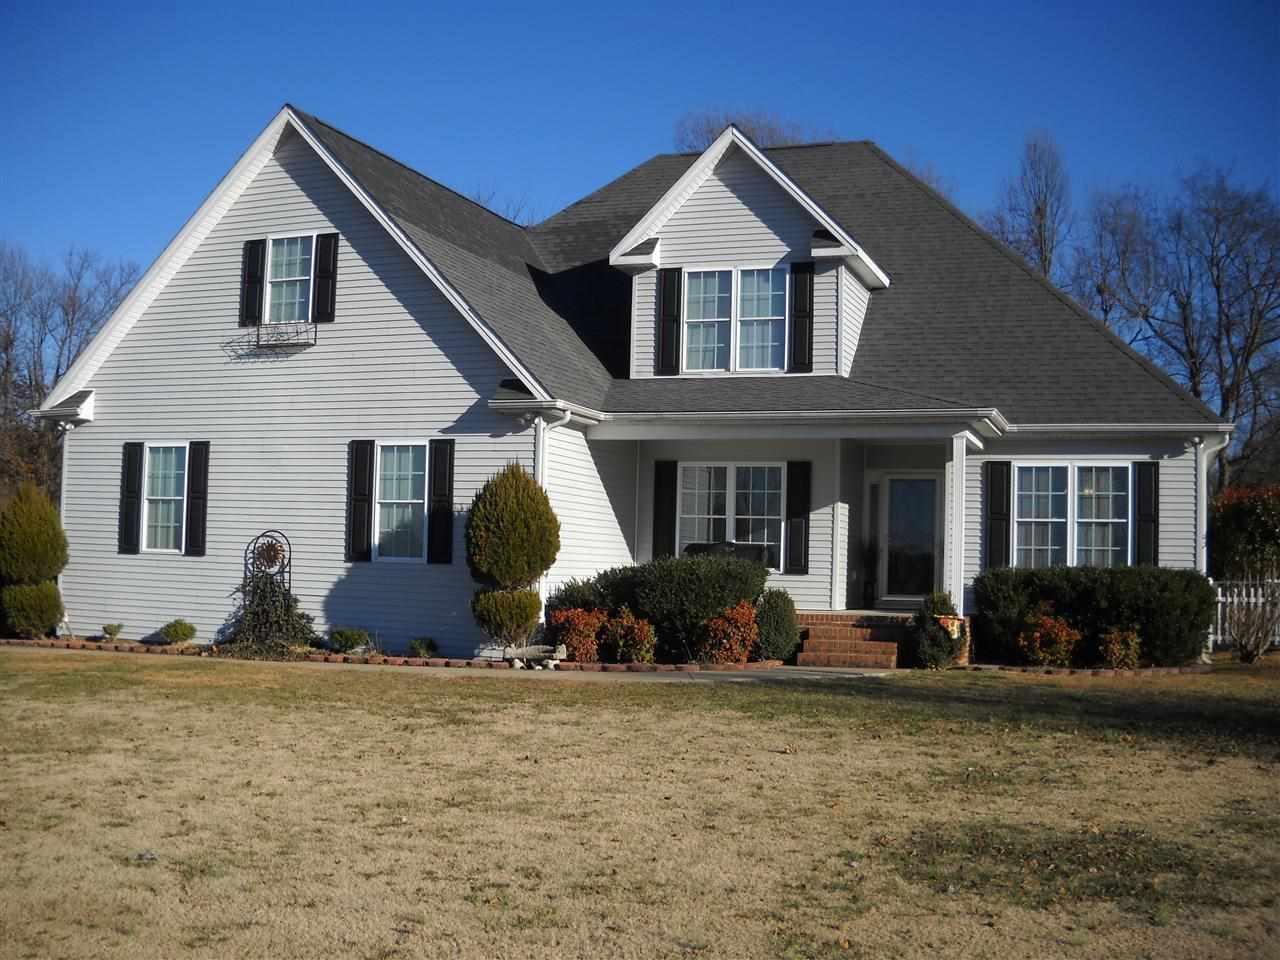 Real Estate for Sale, ListingId: 31314618, West Paducah,KY42086